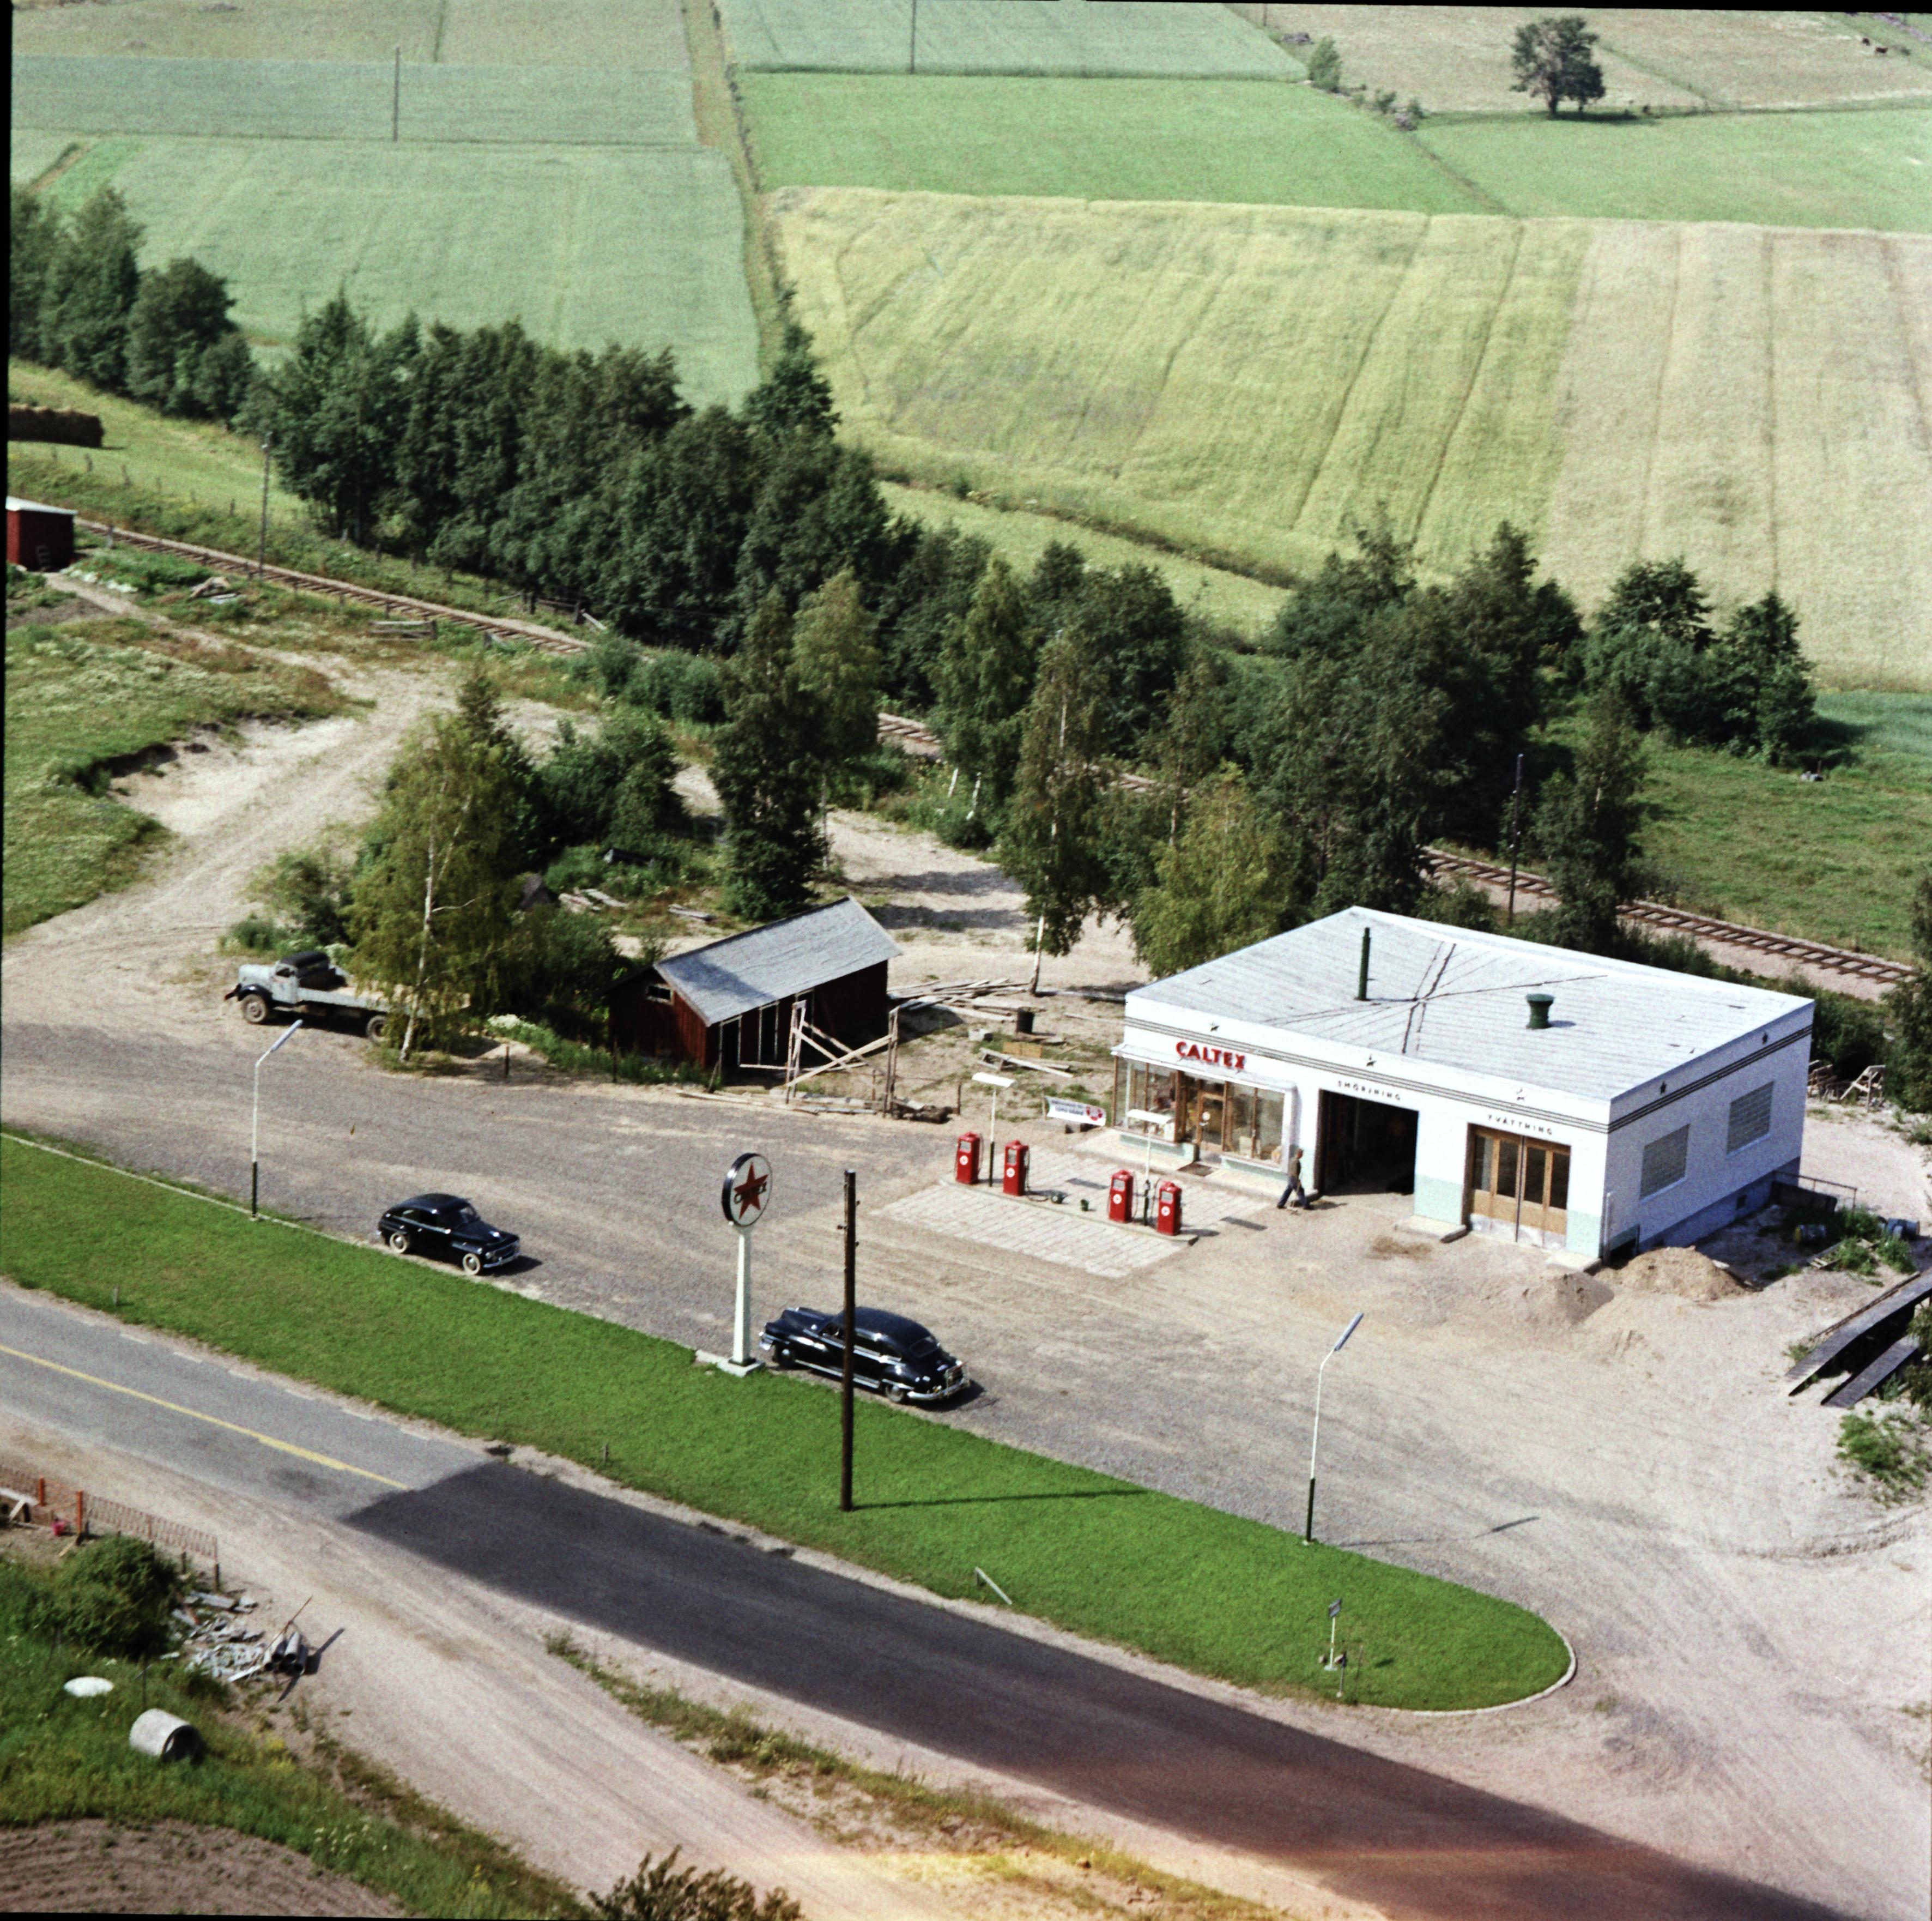 ldreboende i Gullspng | patient-survey.net